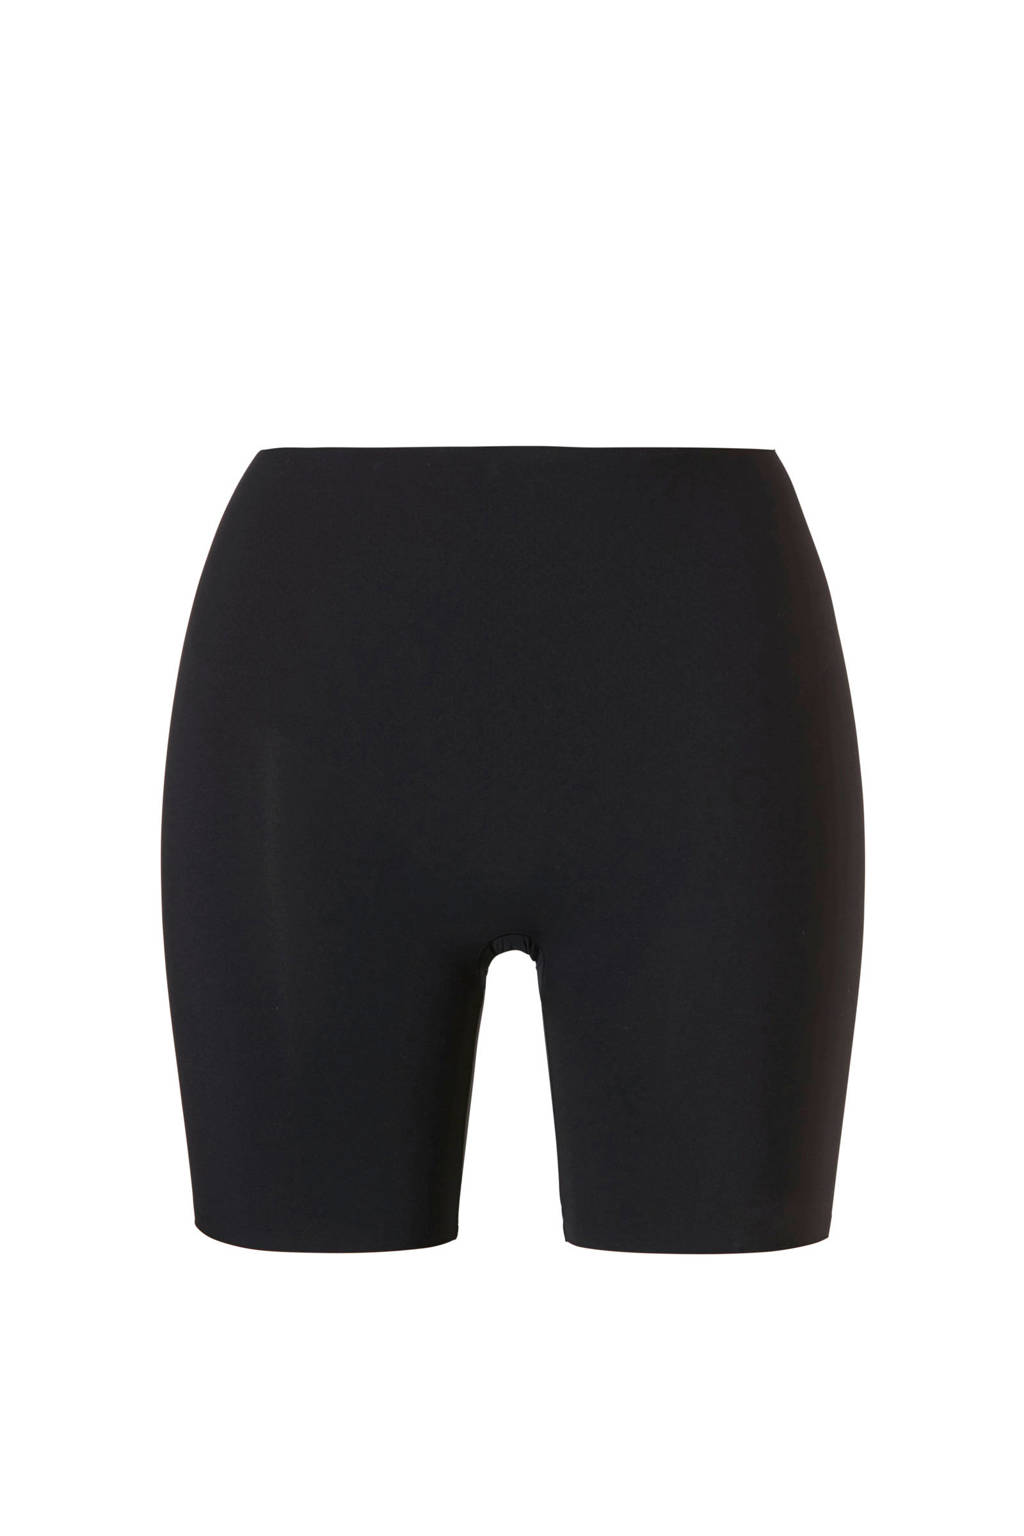 ten Cate Secrets Shape naadloze corrigerende short zwart, Zwart